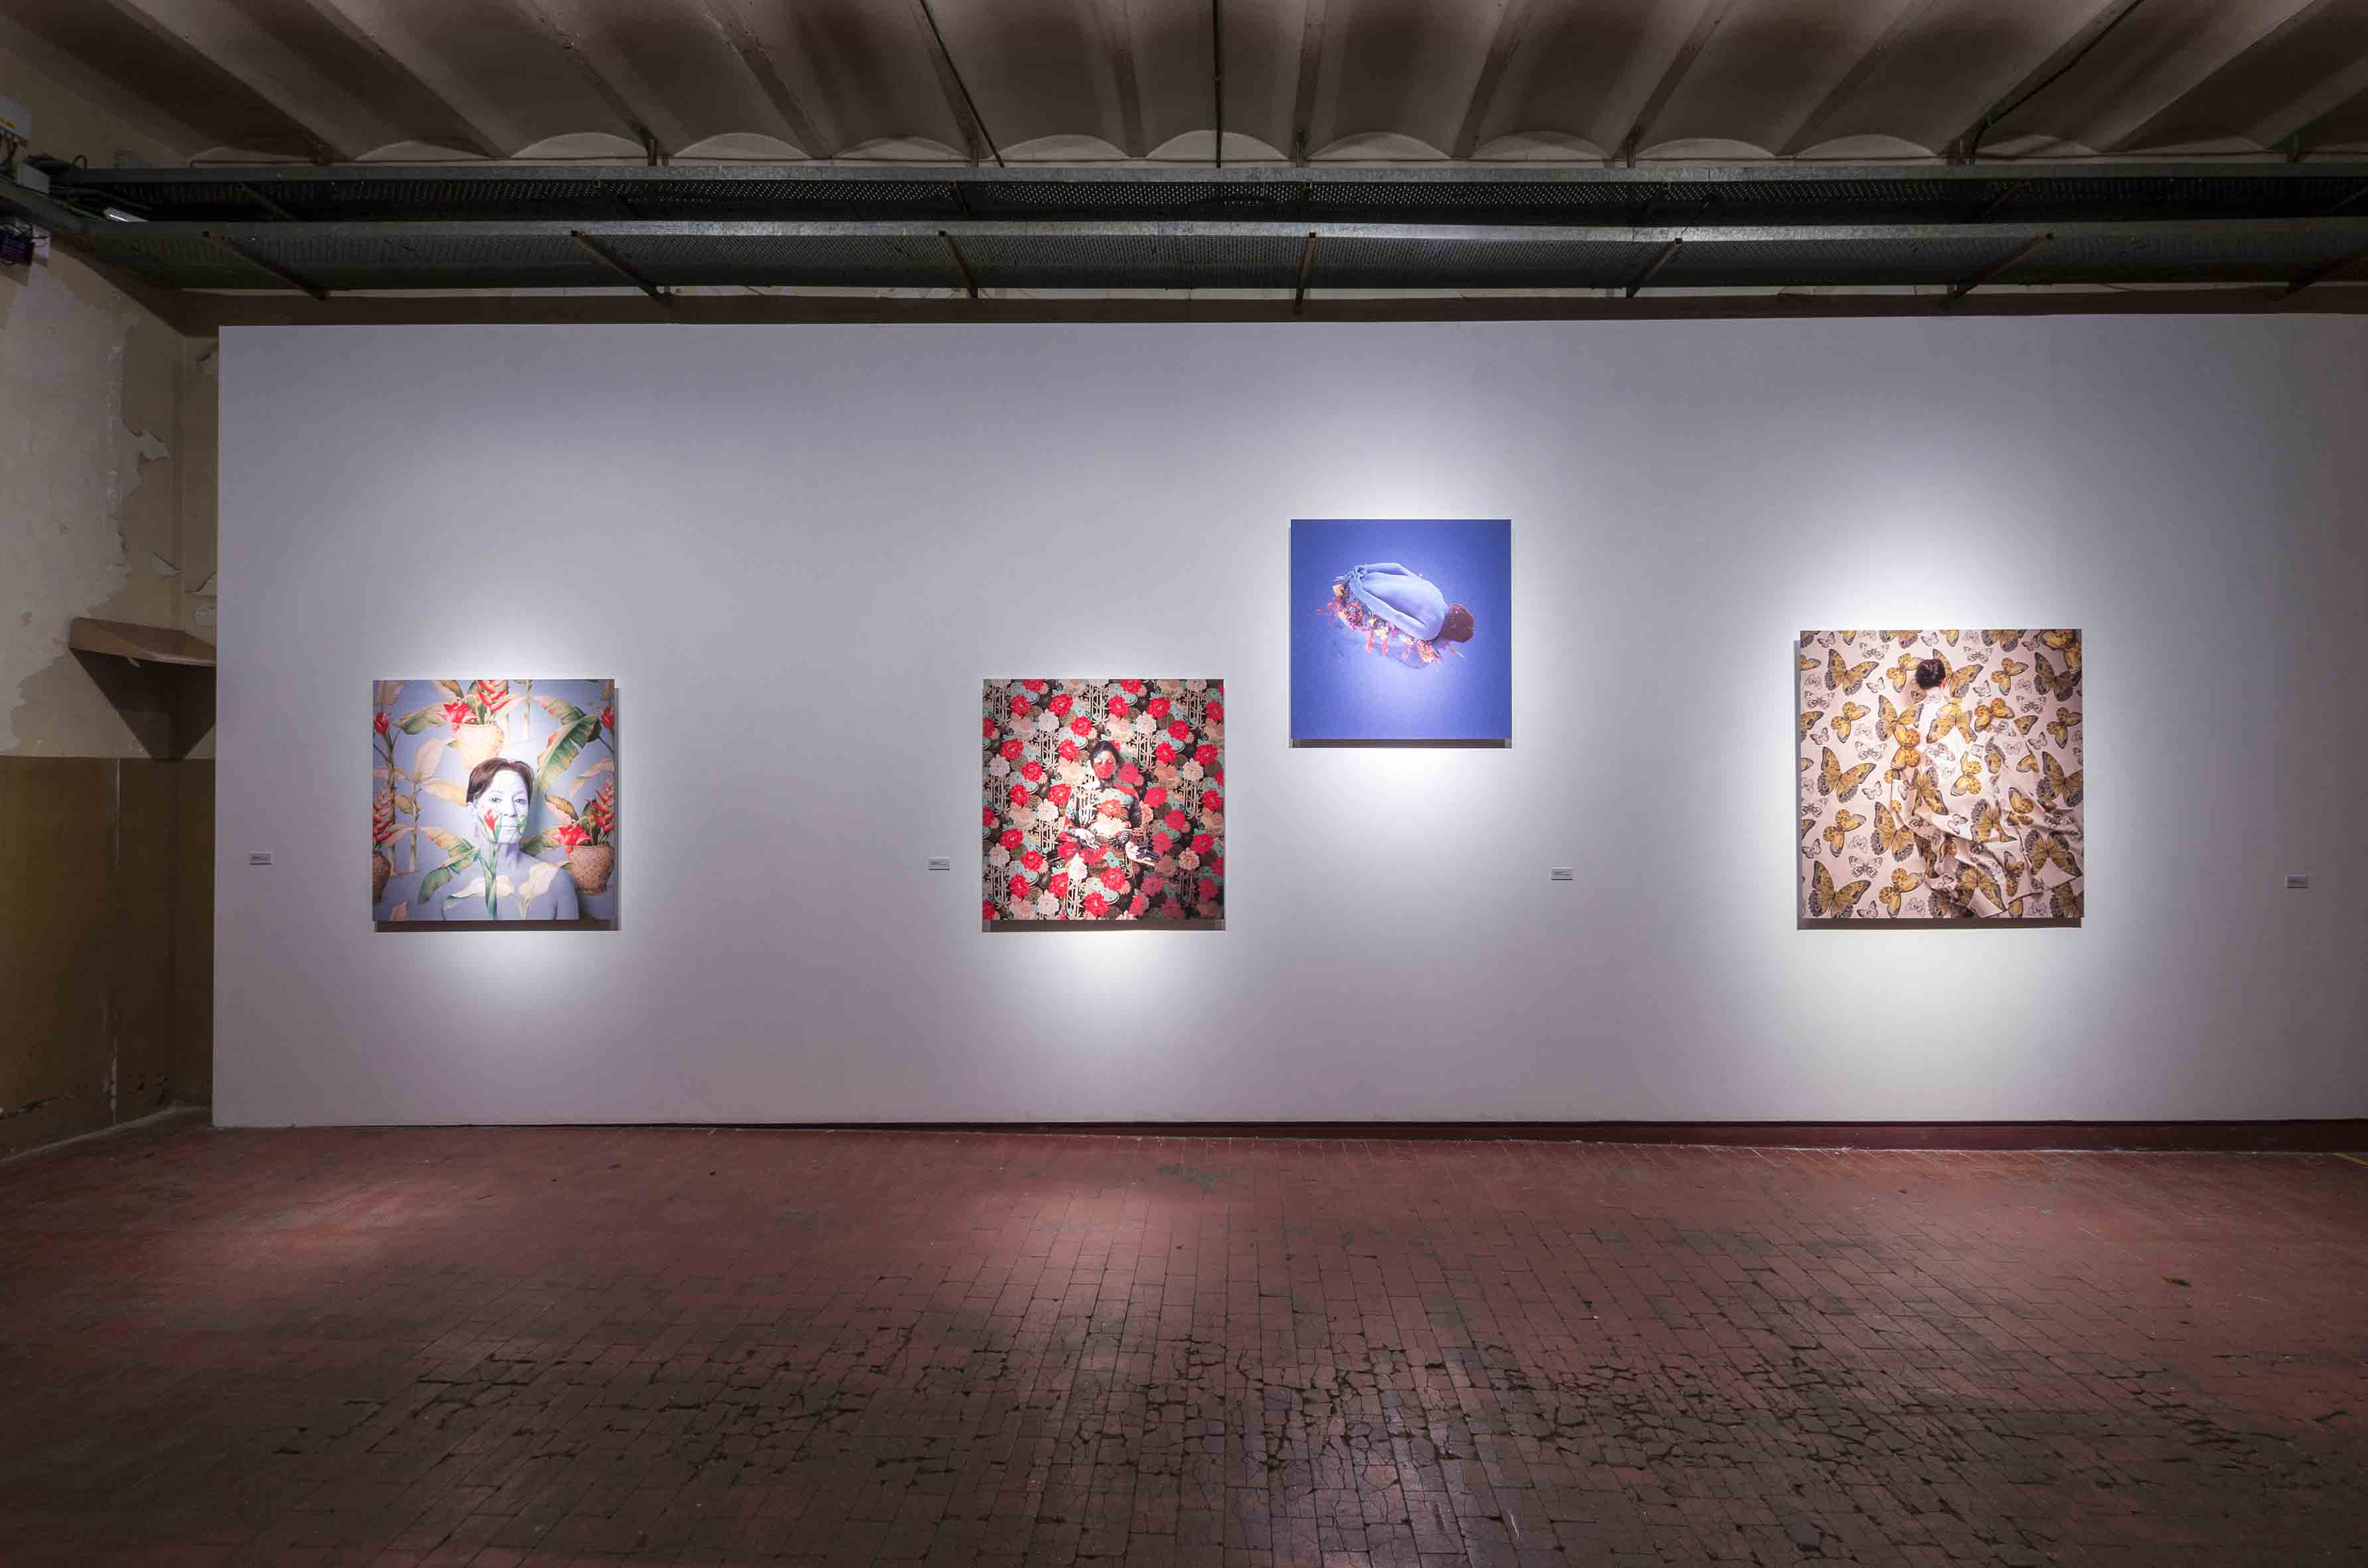 Paisaje azul, 201; Ruta de bambú, 2012; Lago de las alturas, 2007; Paradise, 2009<br/>